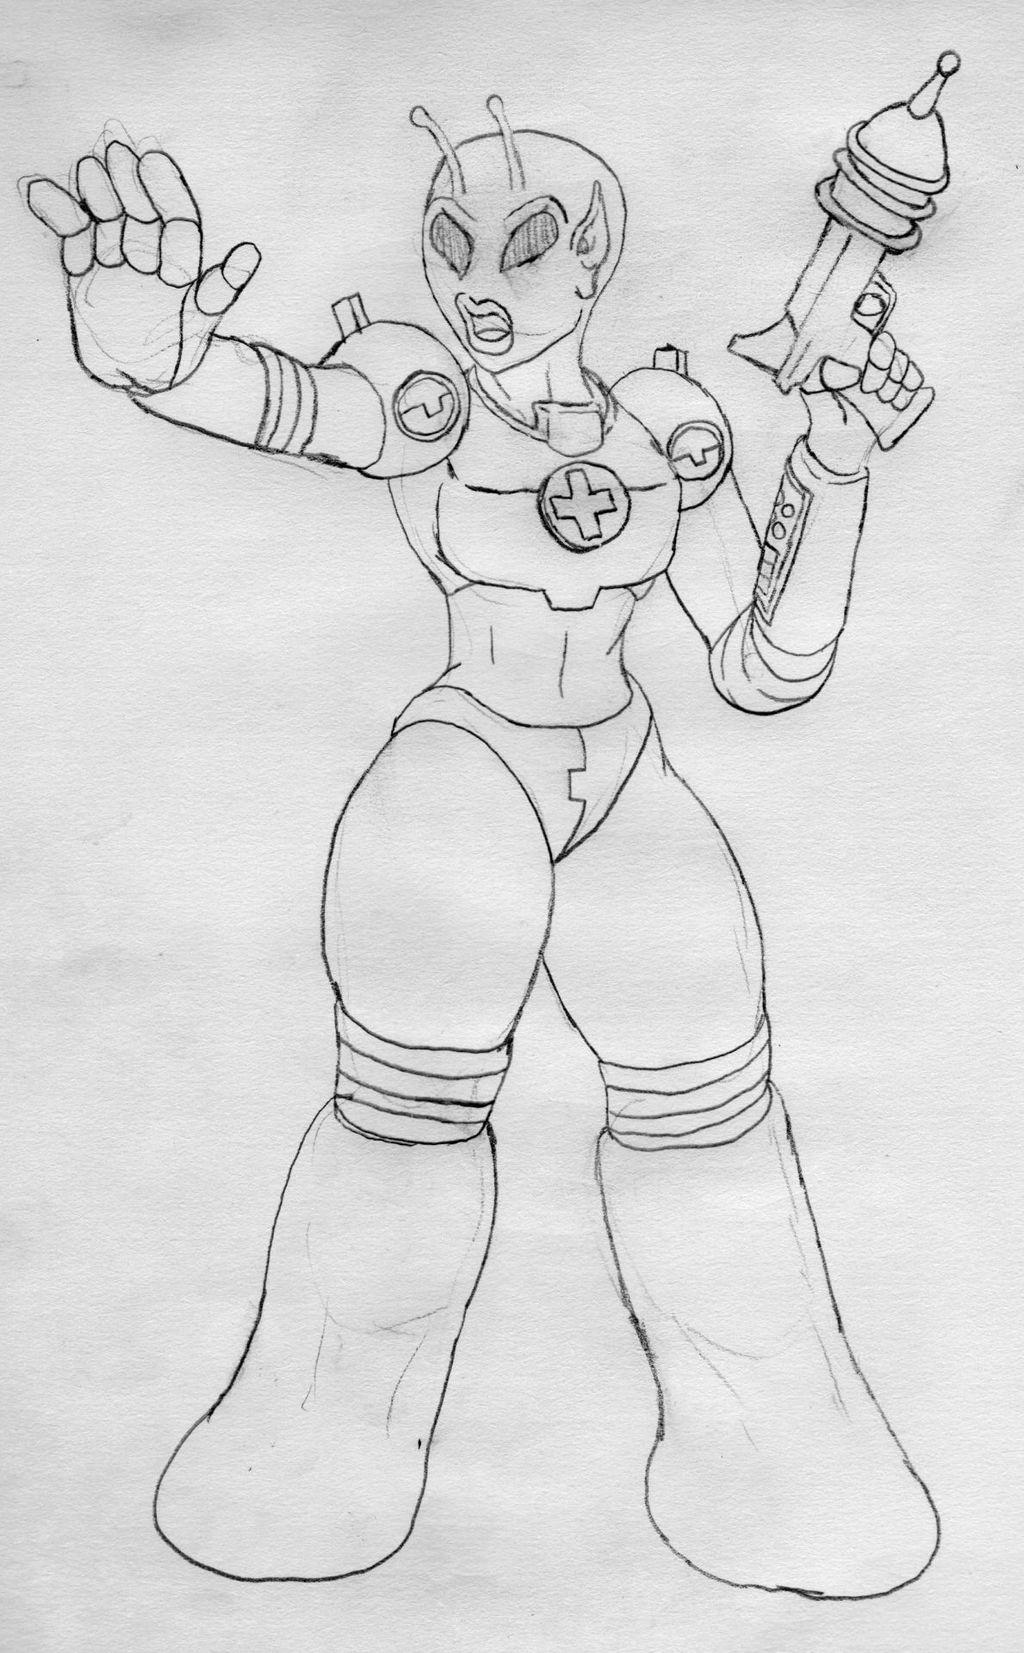 Dr. Quasar, Defender of the Galaxy